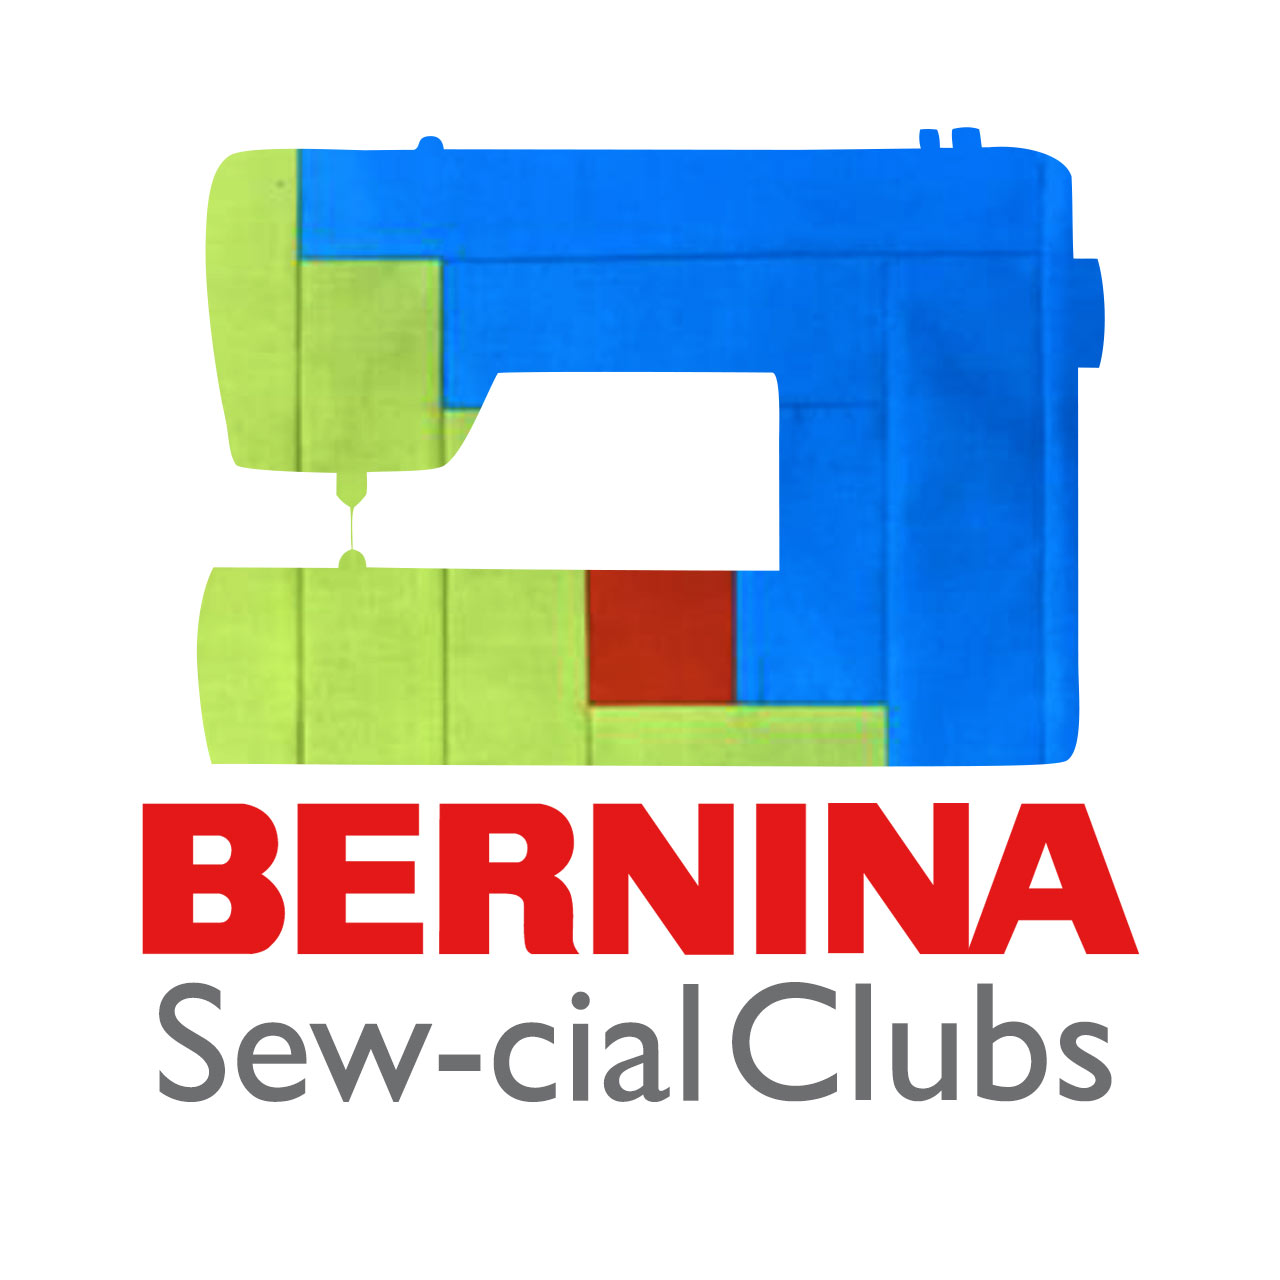 Upcoming Bernina Sew-cial Club Topics